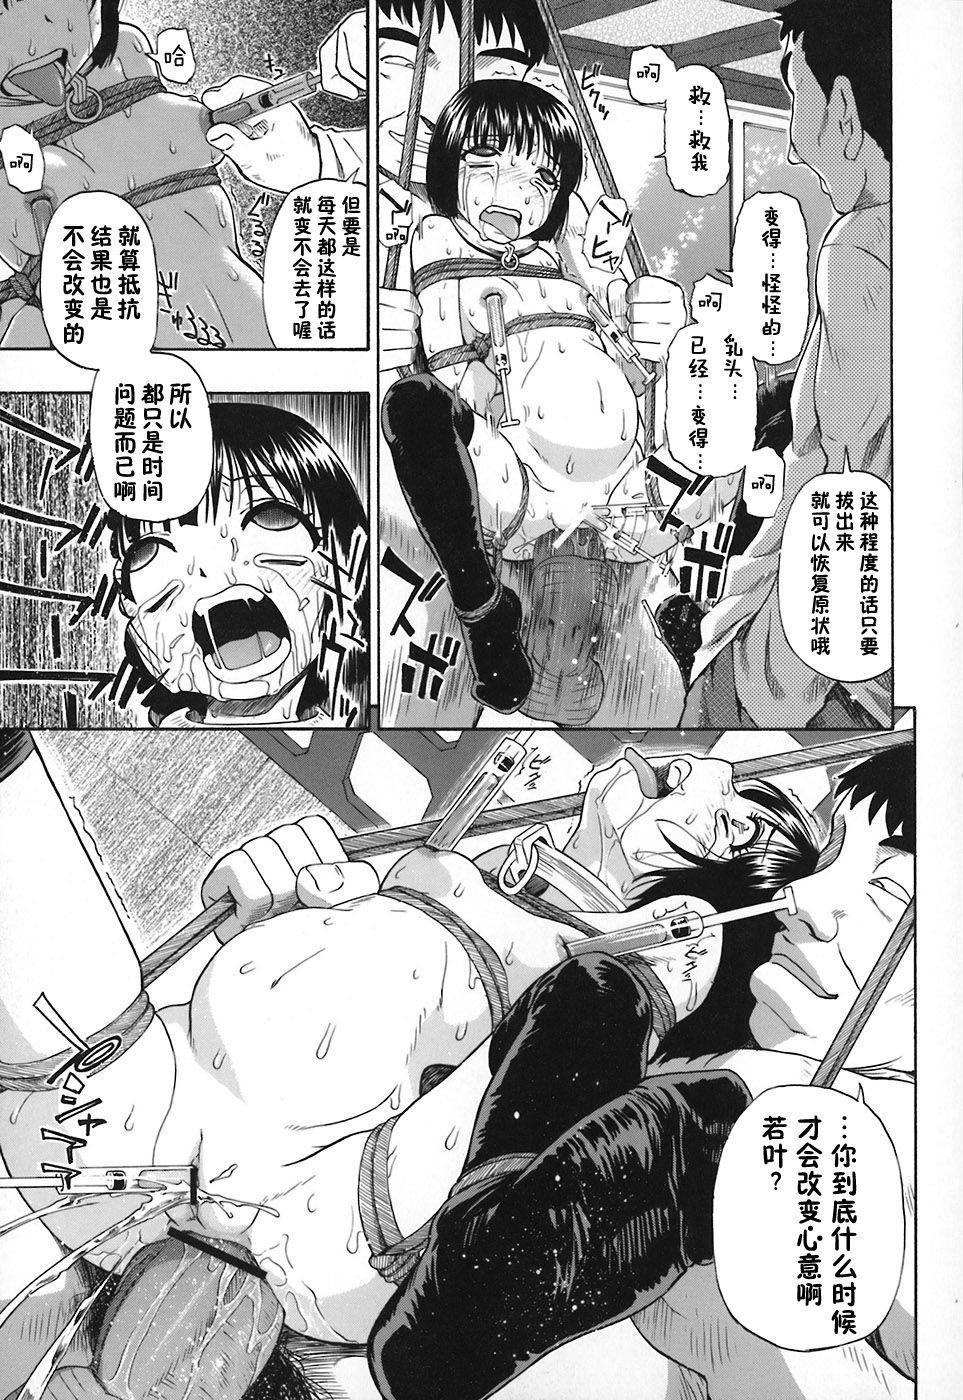 Akutoku no Sakae - Prosperites du Vice 50